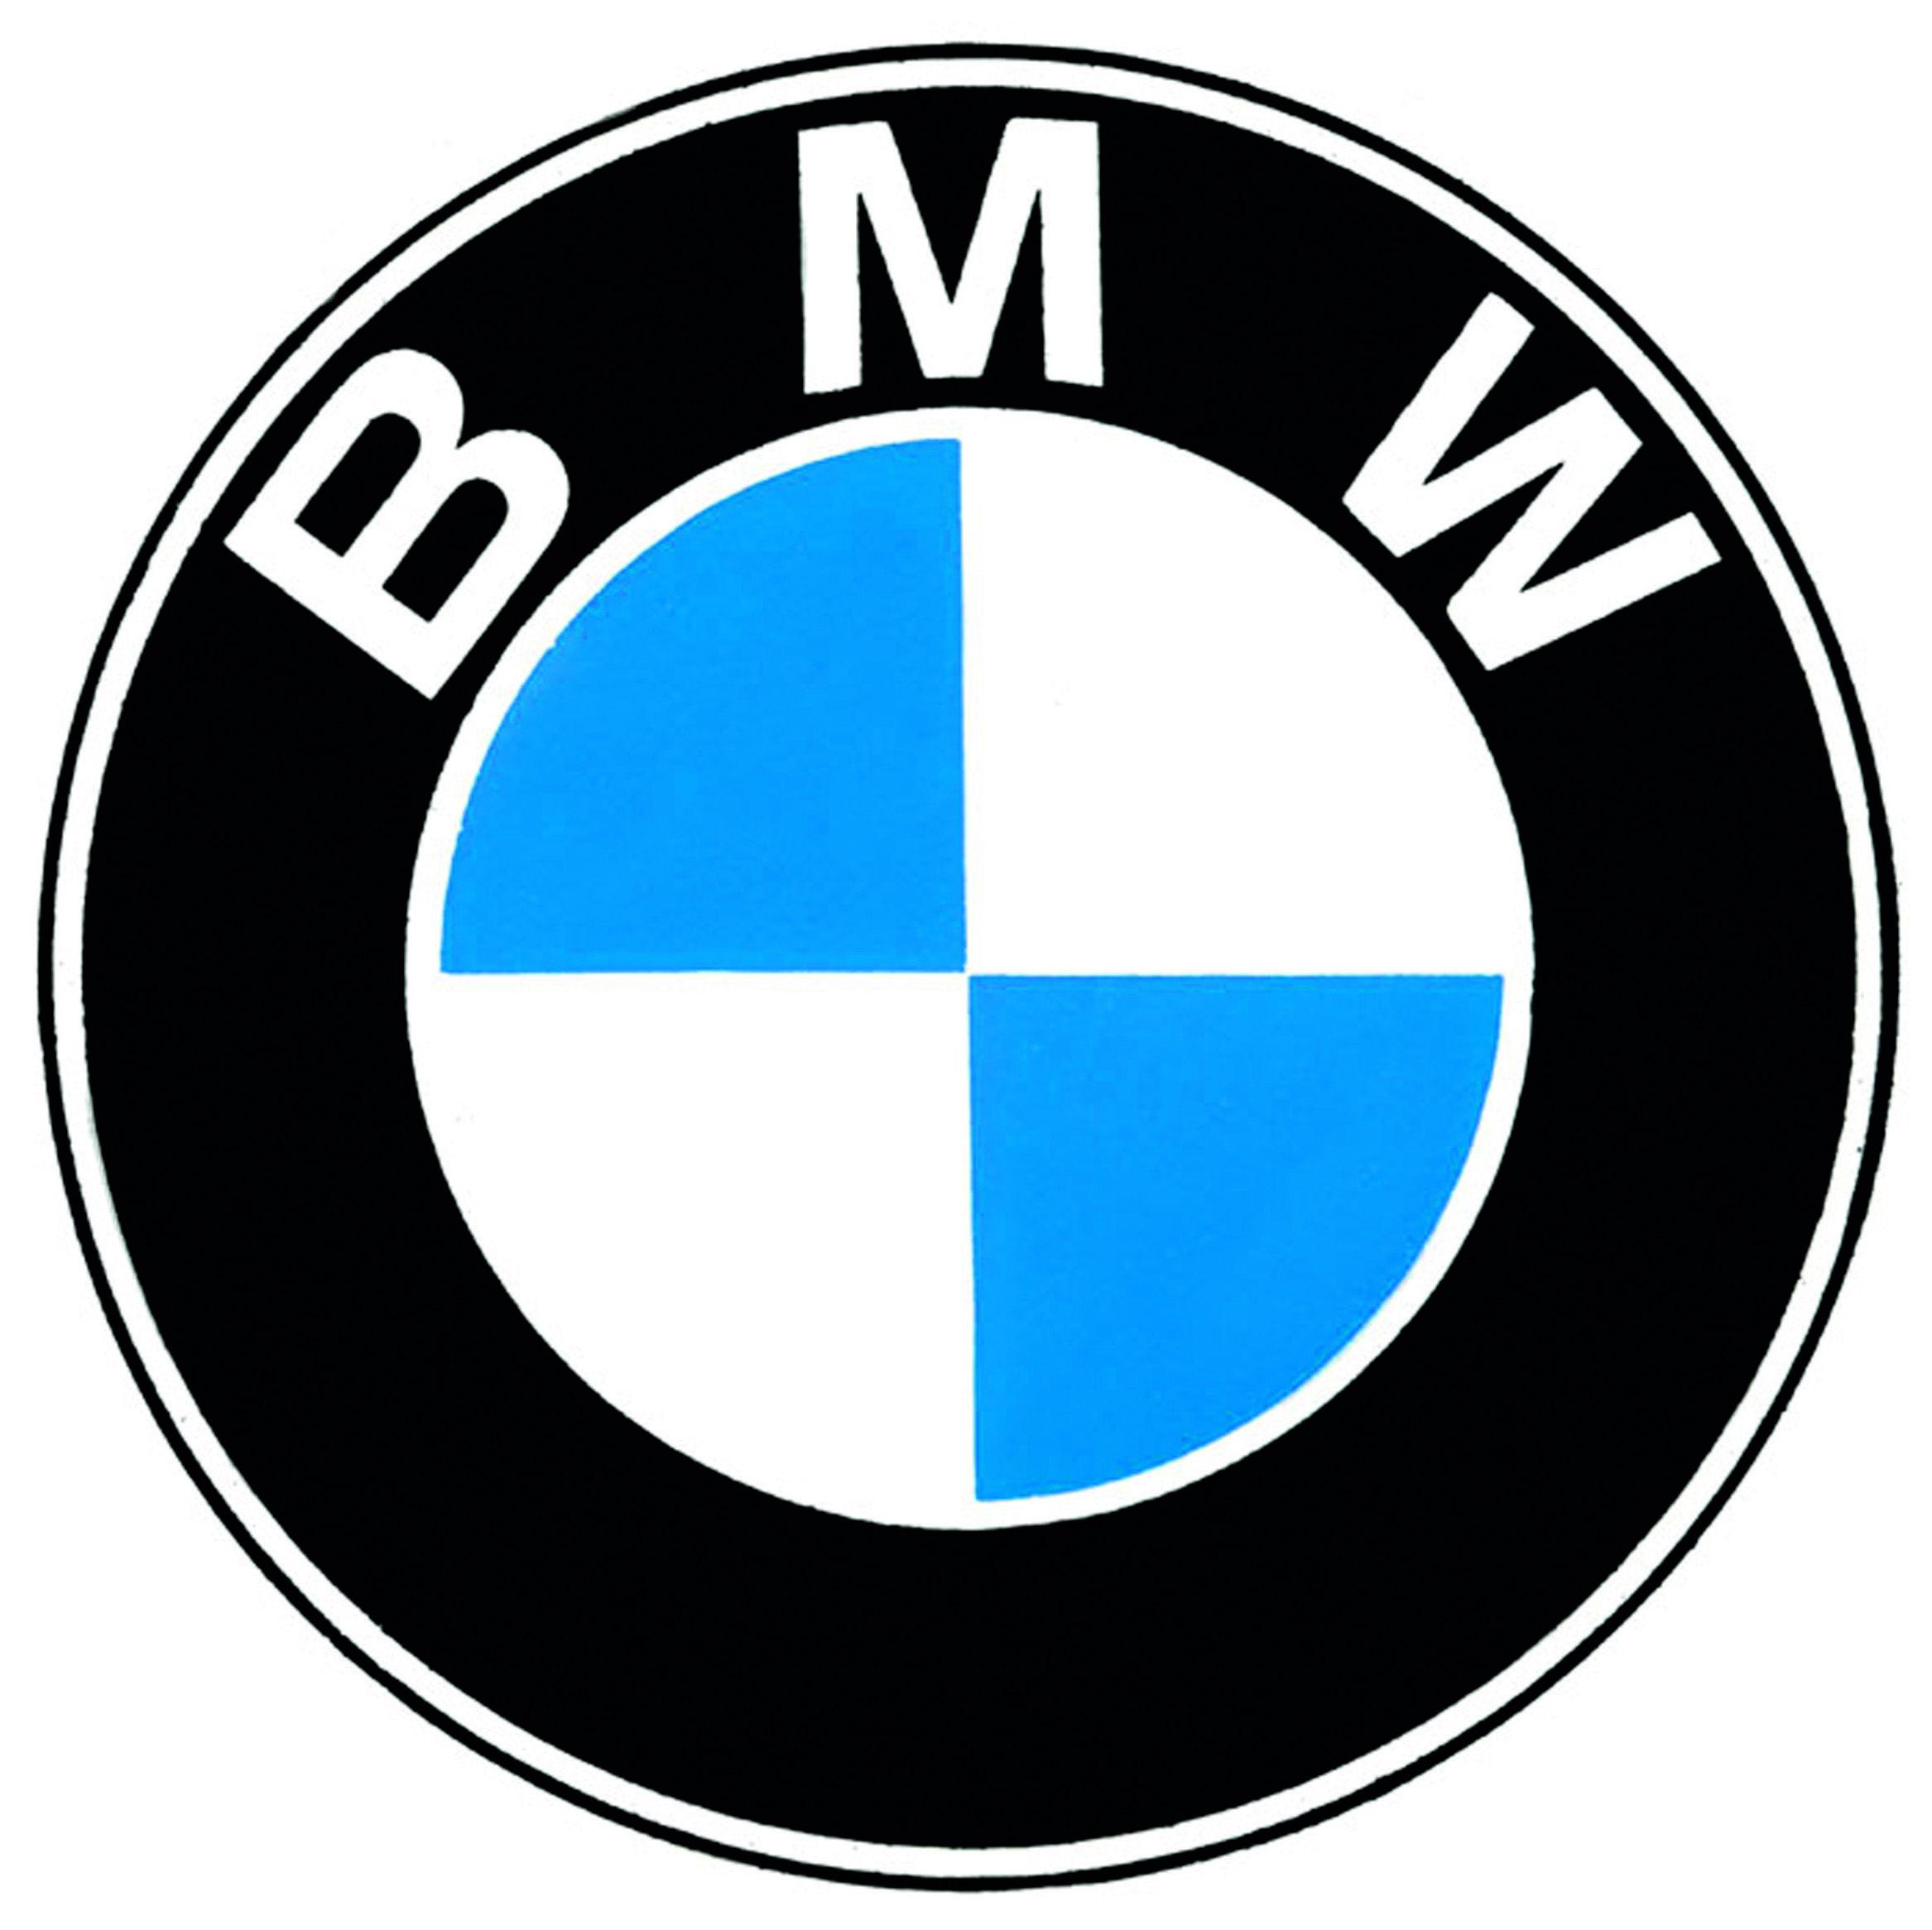 bmw logo hd wallpapers